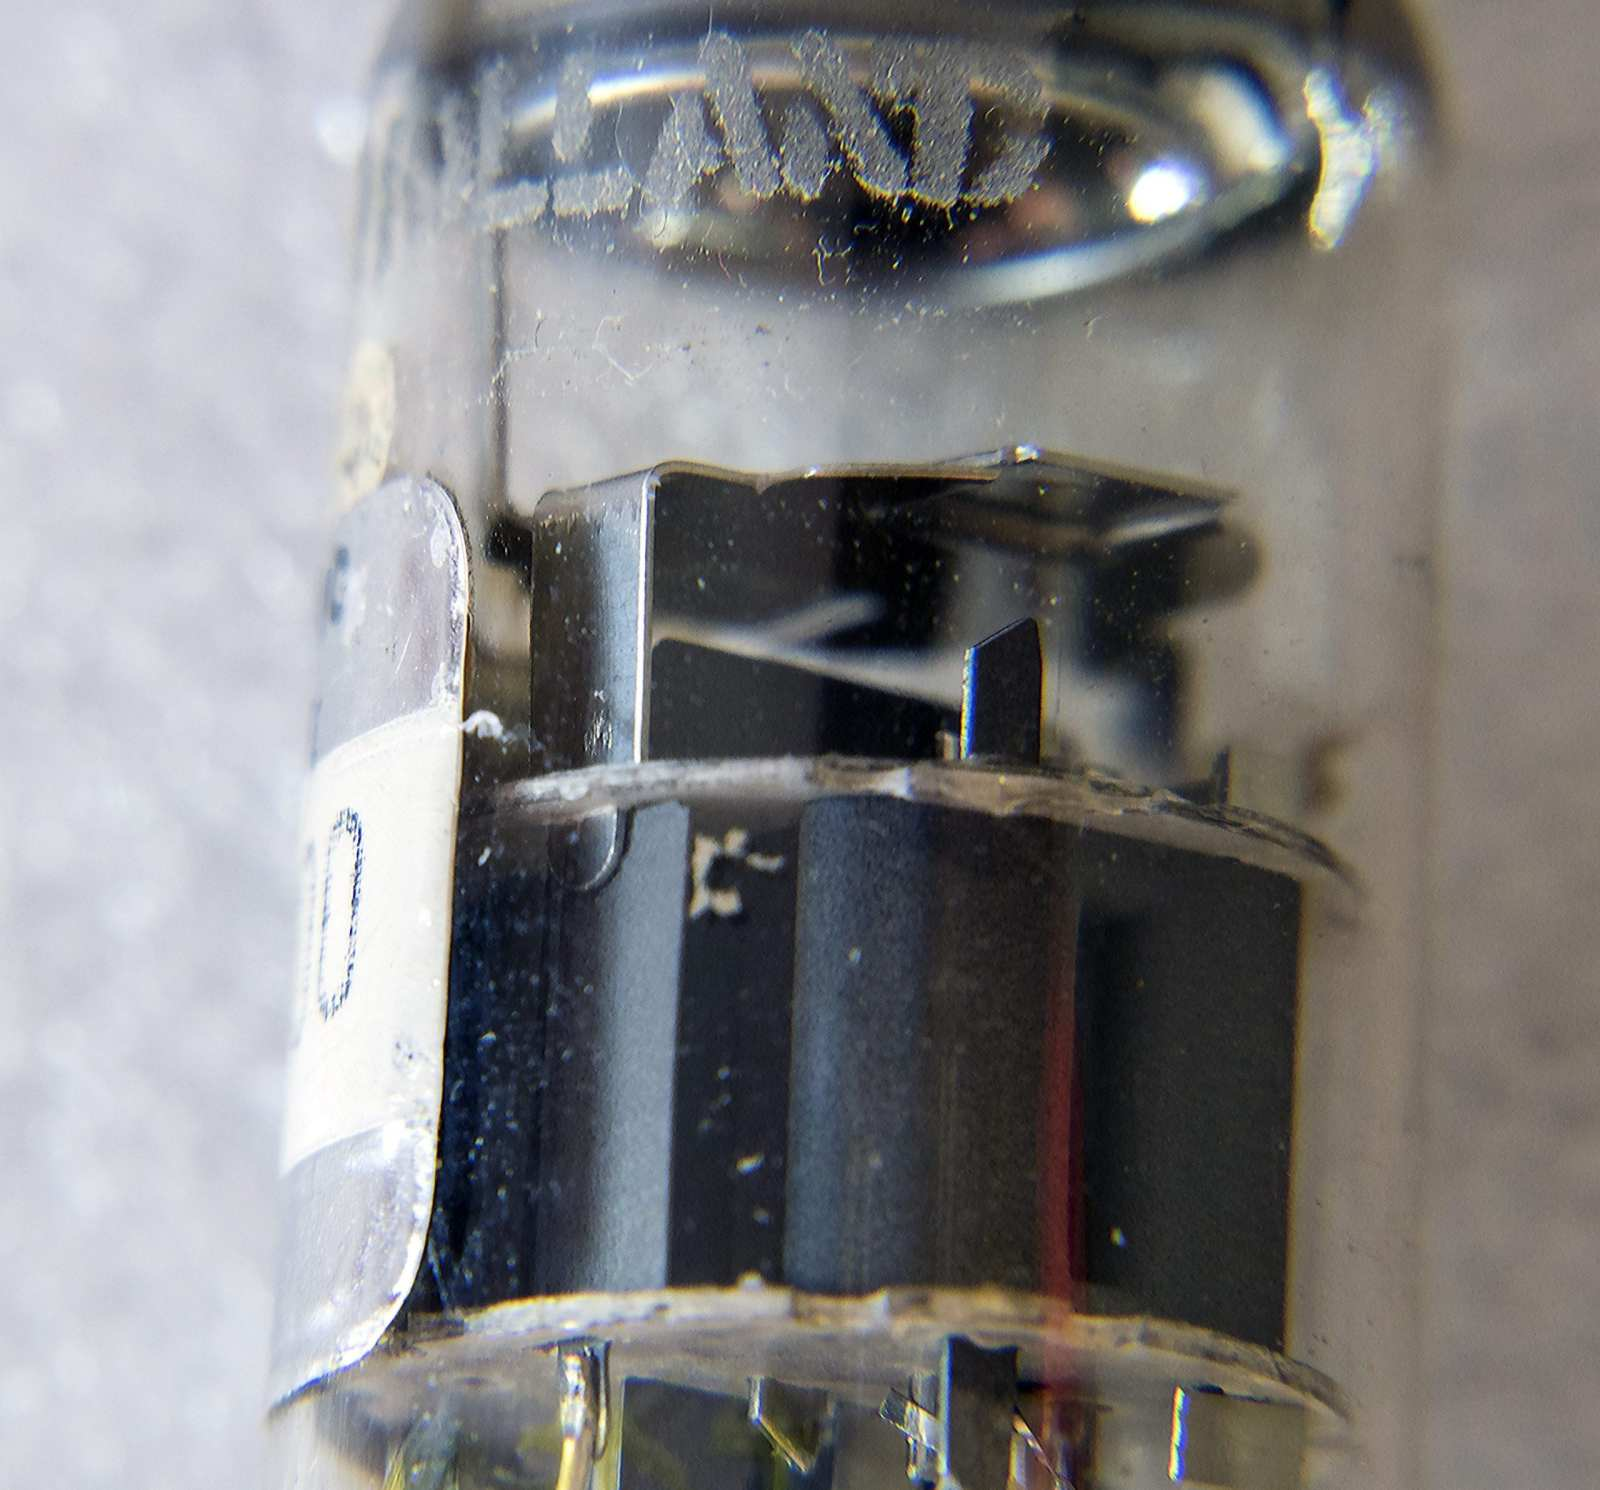 1963 Amperex 7308 Bugle Boy 4